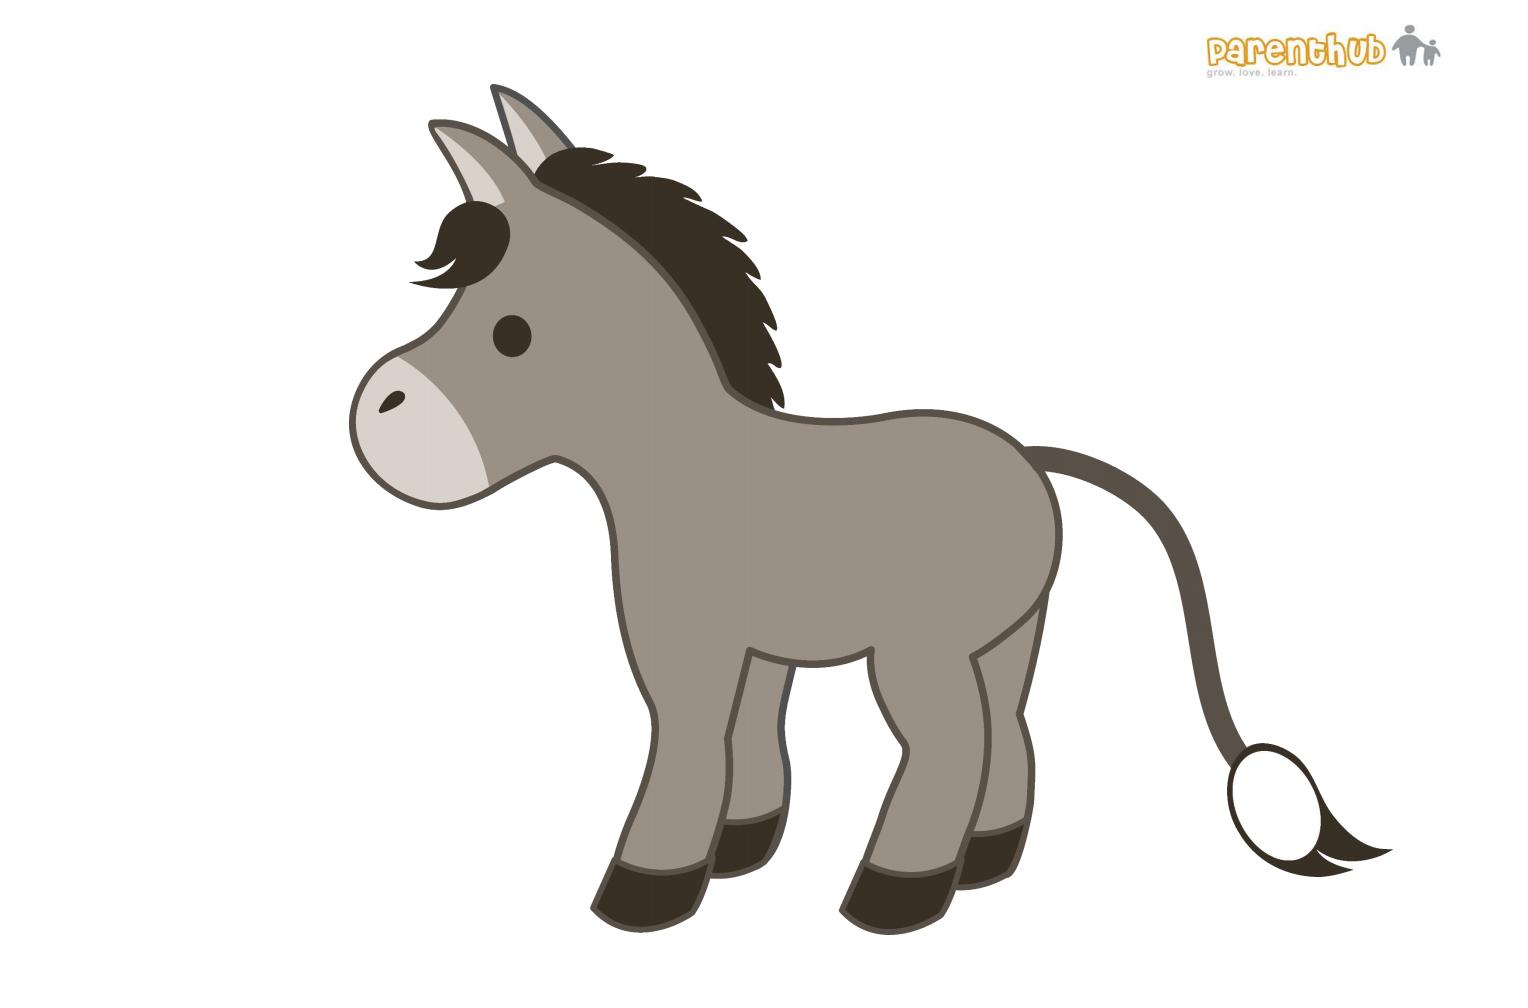 Pin The Tail Printables | Tefl | Pinterest | Printables, The Donkey - Pin The Tail On The Donkey Printable Free